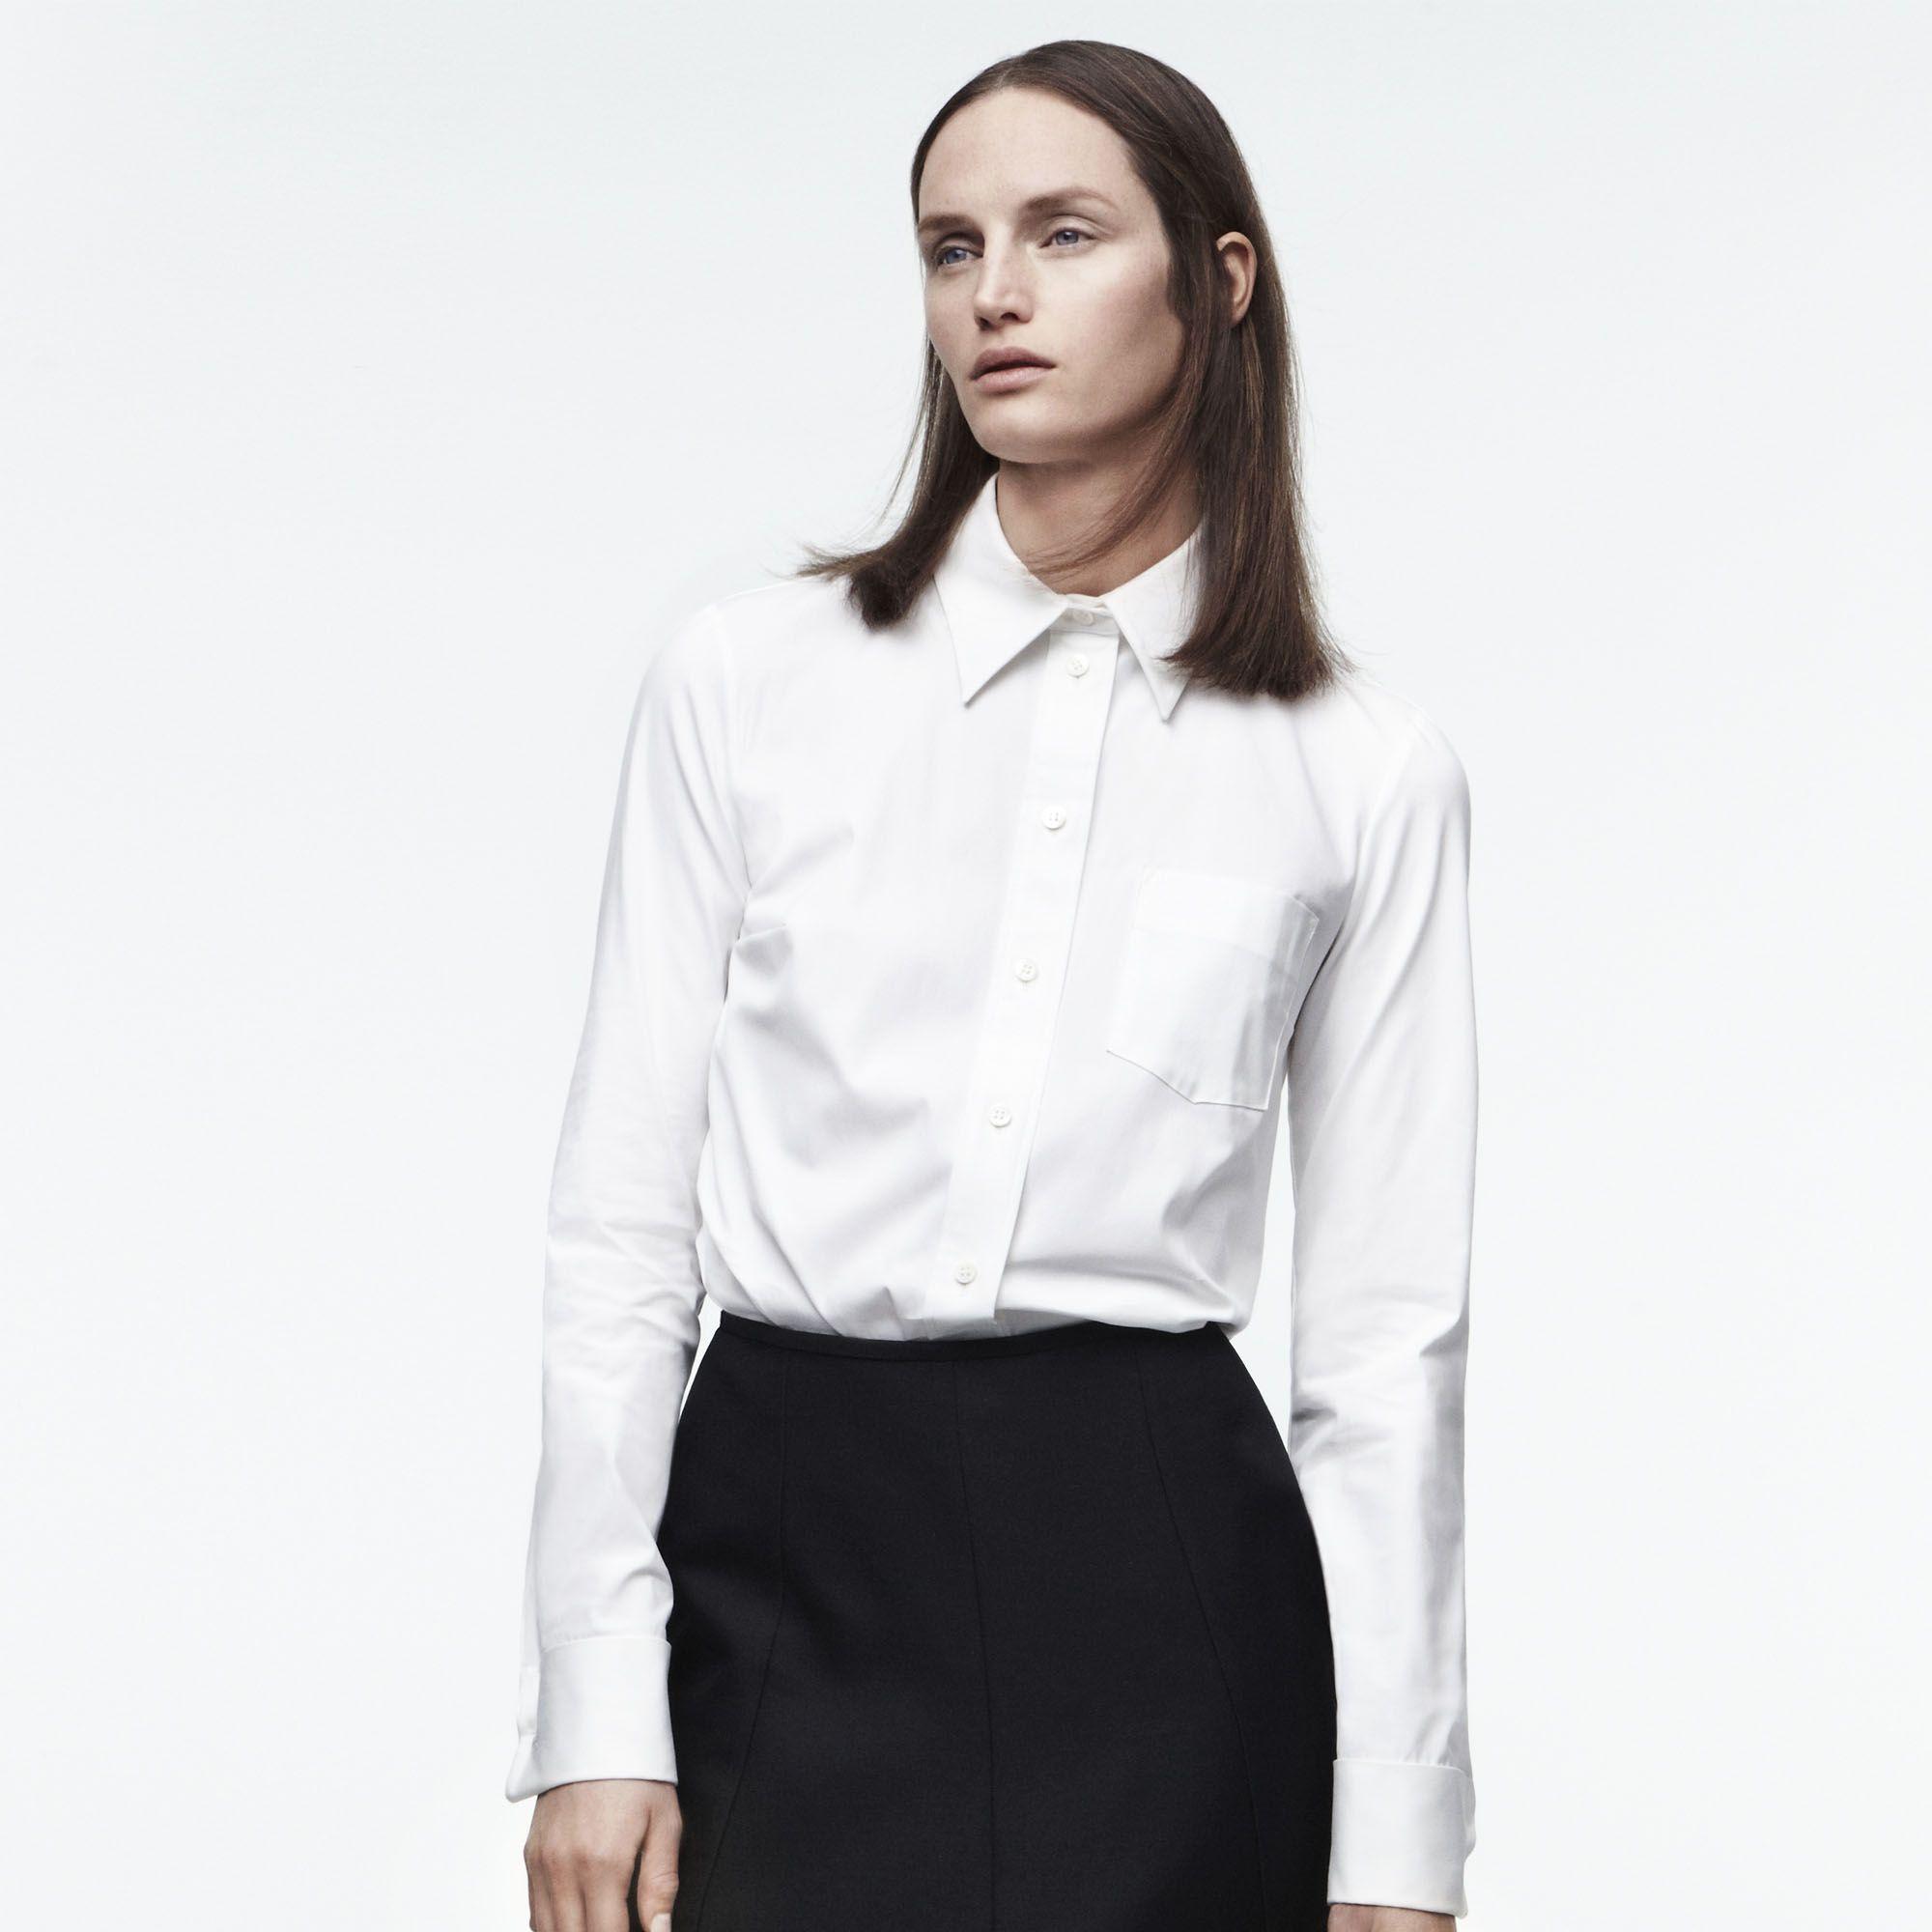 "Your wardrobe refresh starts with the shirt.&nbsp&#x3B;<strong>Michael Kors</strong> <a href=""http://shop.harpersbazaar.com/designers/michael-kors/white-poplin-french-cuff-shirt/"">shirt</a>, $595&nbsp&#x3B; and skirt, $2,650, <a href=""http://shop.harpersbazaar.com/designers/michael-kors/"">shopBAZAAR.com</a><img src=""http://assets.hdmtools.com/images/HBZ/Shop.svg"" class=""icon shop"">.&nbsp&#x3B;"